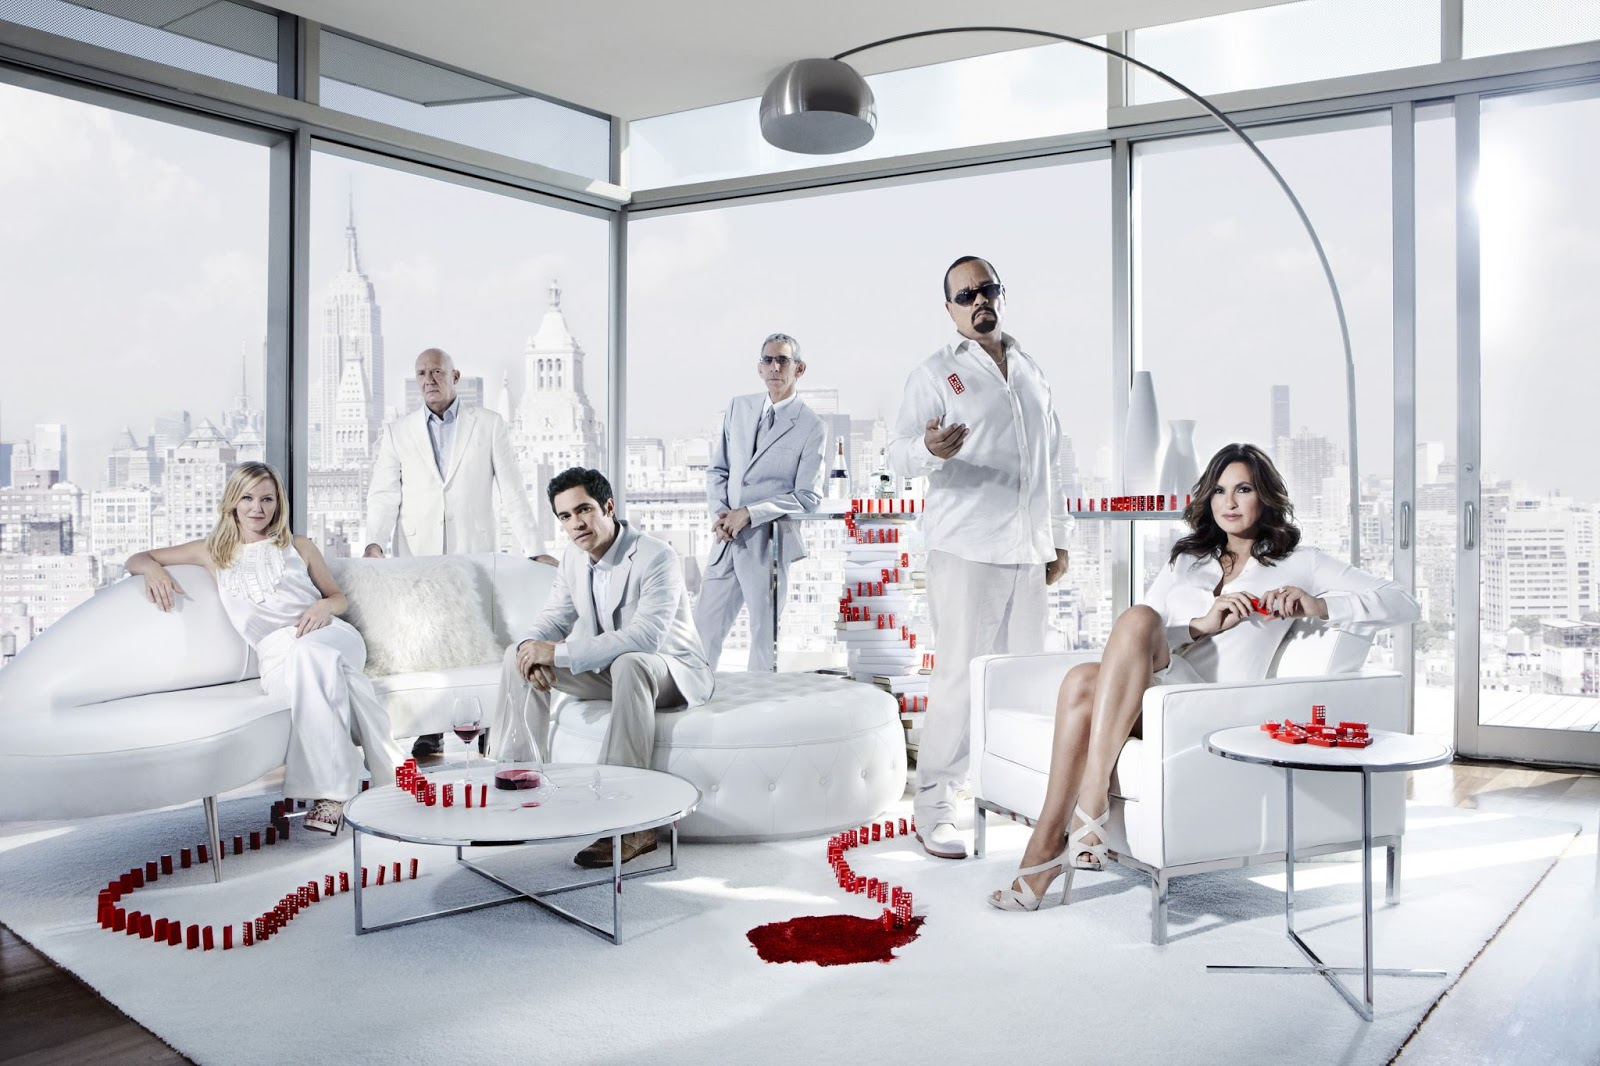 Law & Order: Special Victims Unit: Season 14